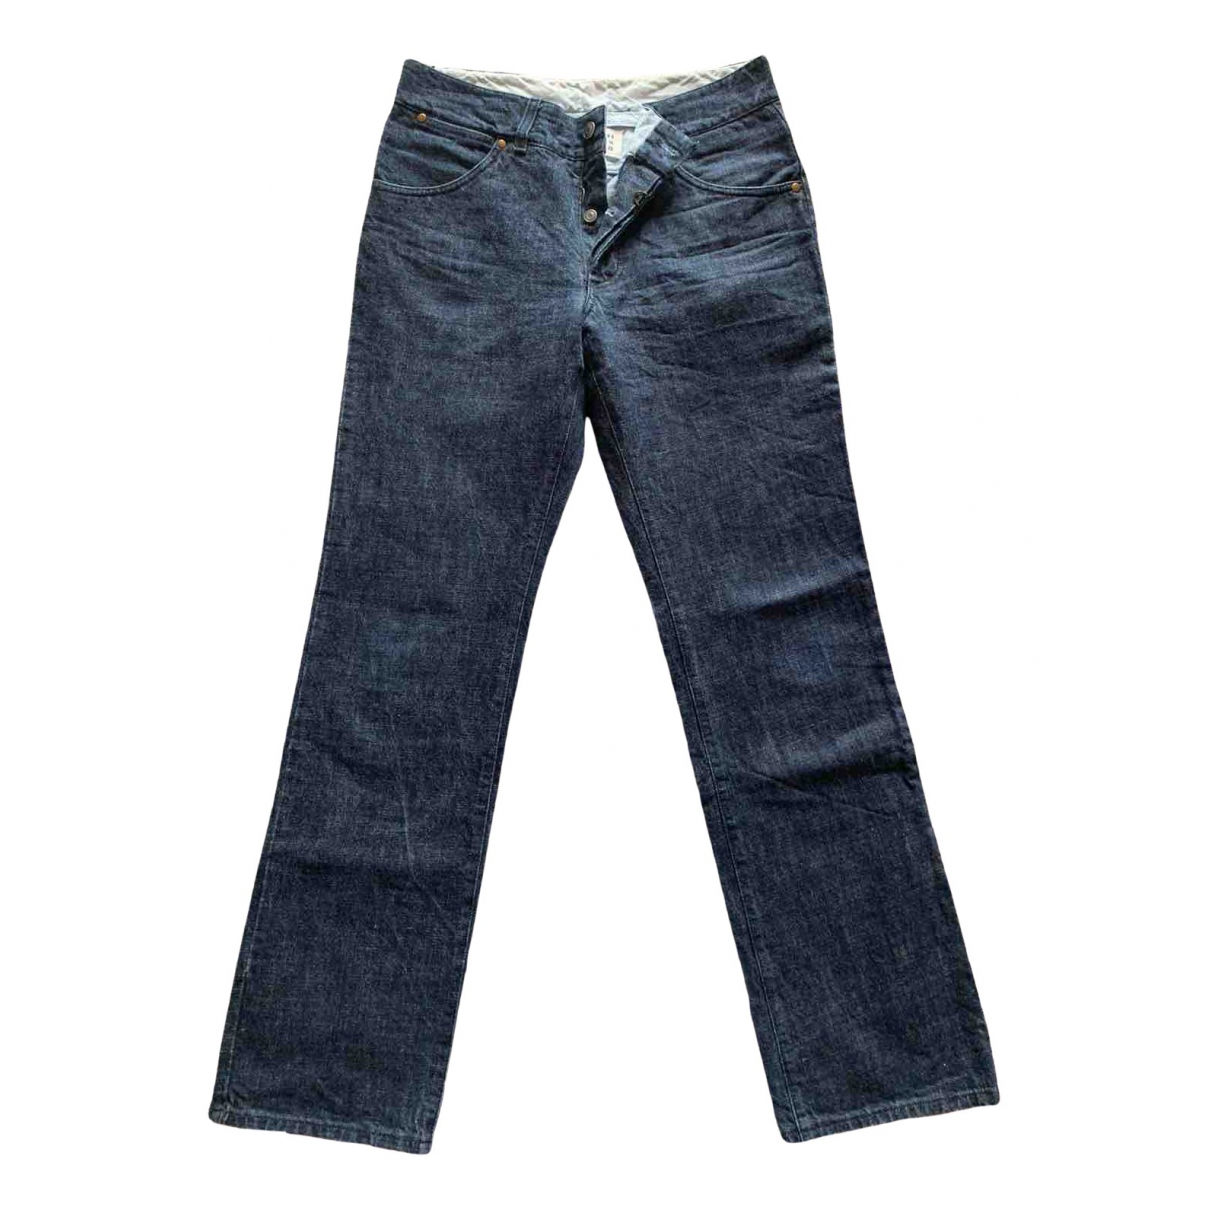 Pantalones en Denim - Vaquero Azul Maison Martin Margiela